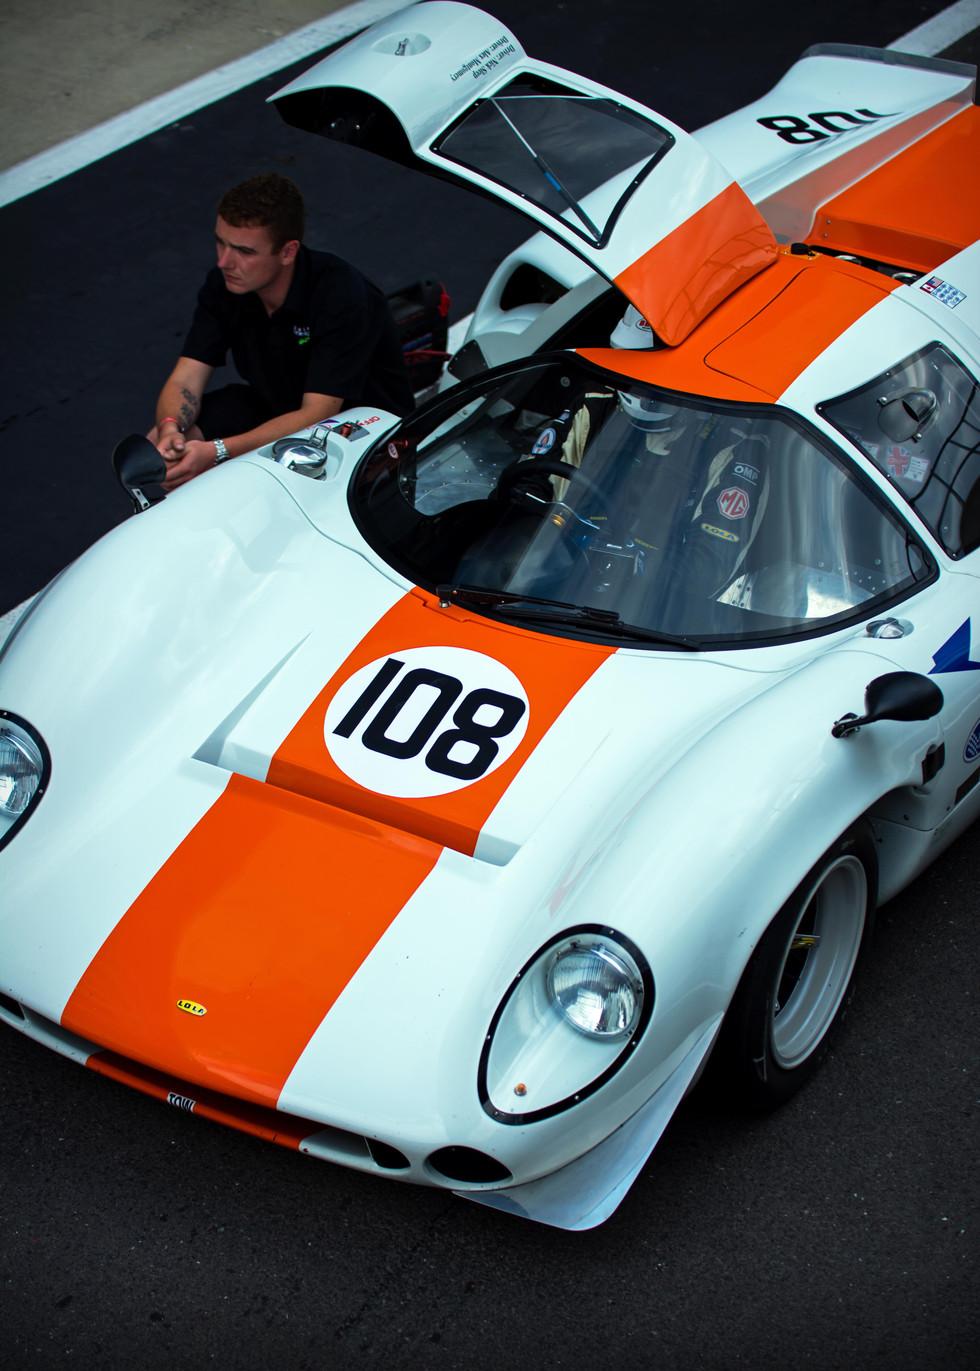 Nick Sleep & Alex Montgomery's 1968 Lola T70 Mk3